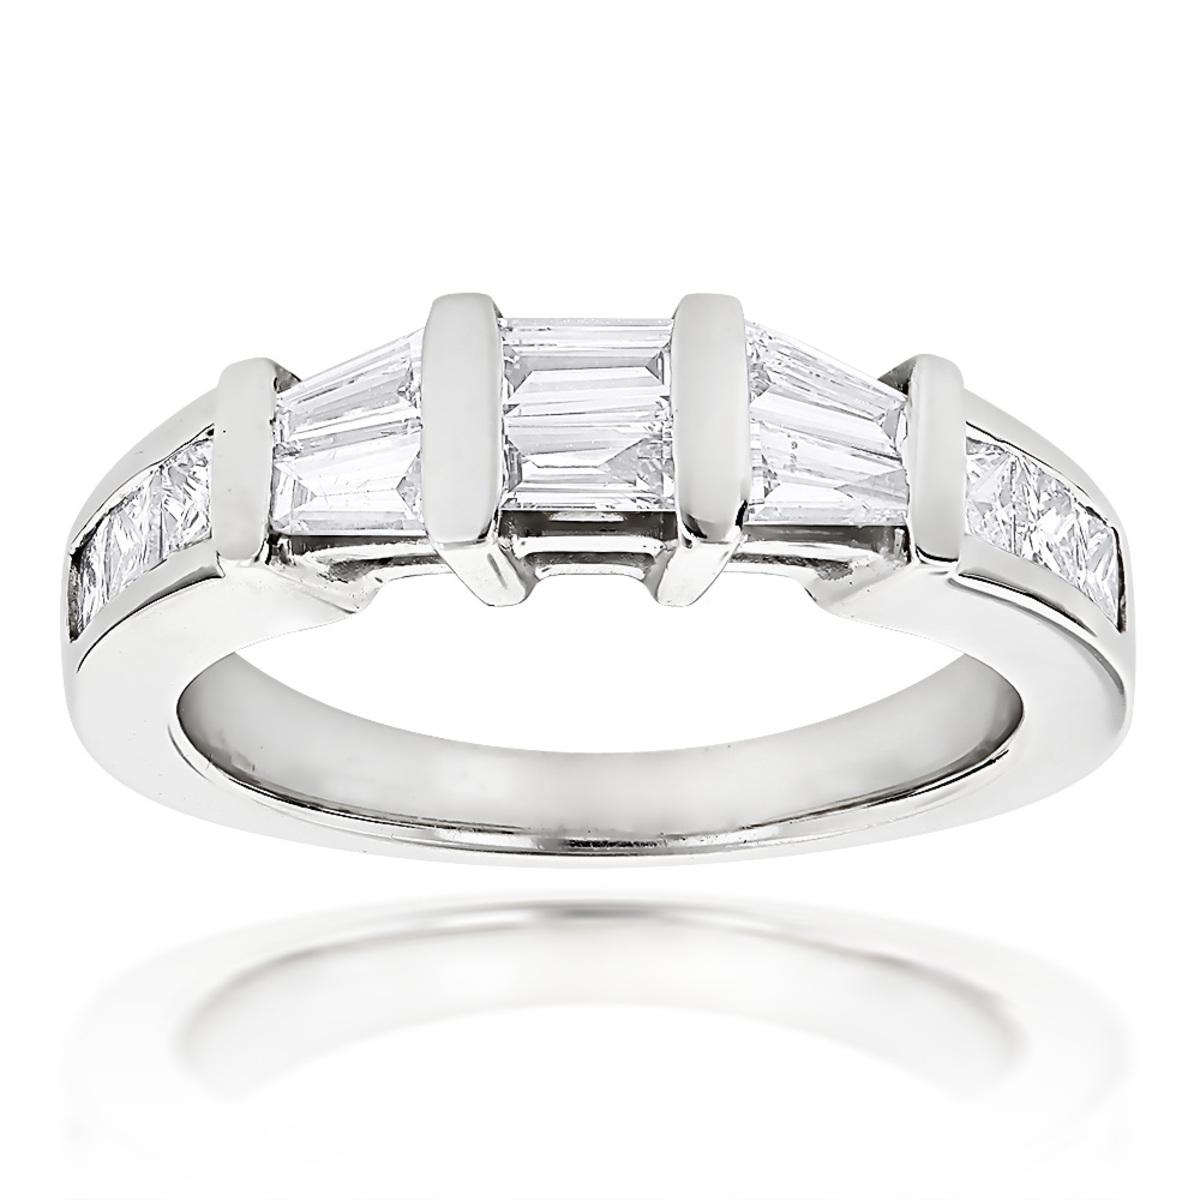 Princess Cut and Baguette Diamond Wedding Band 0.9ct 14K Gold